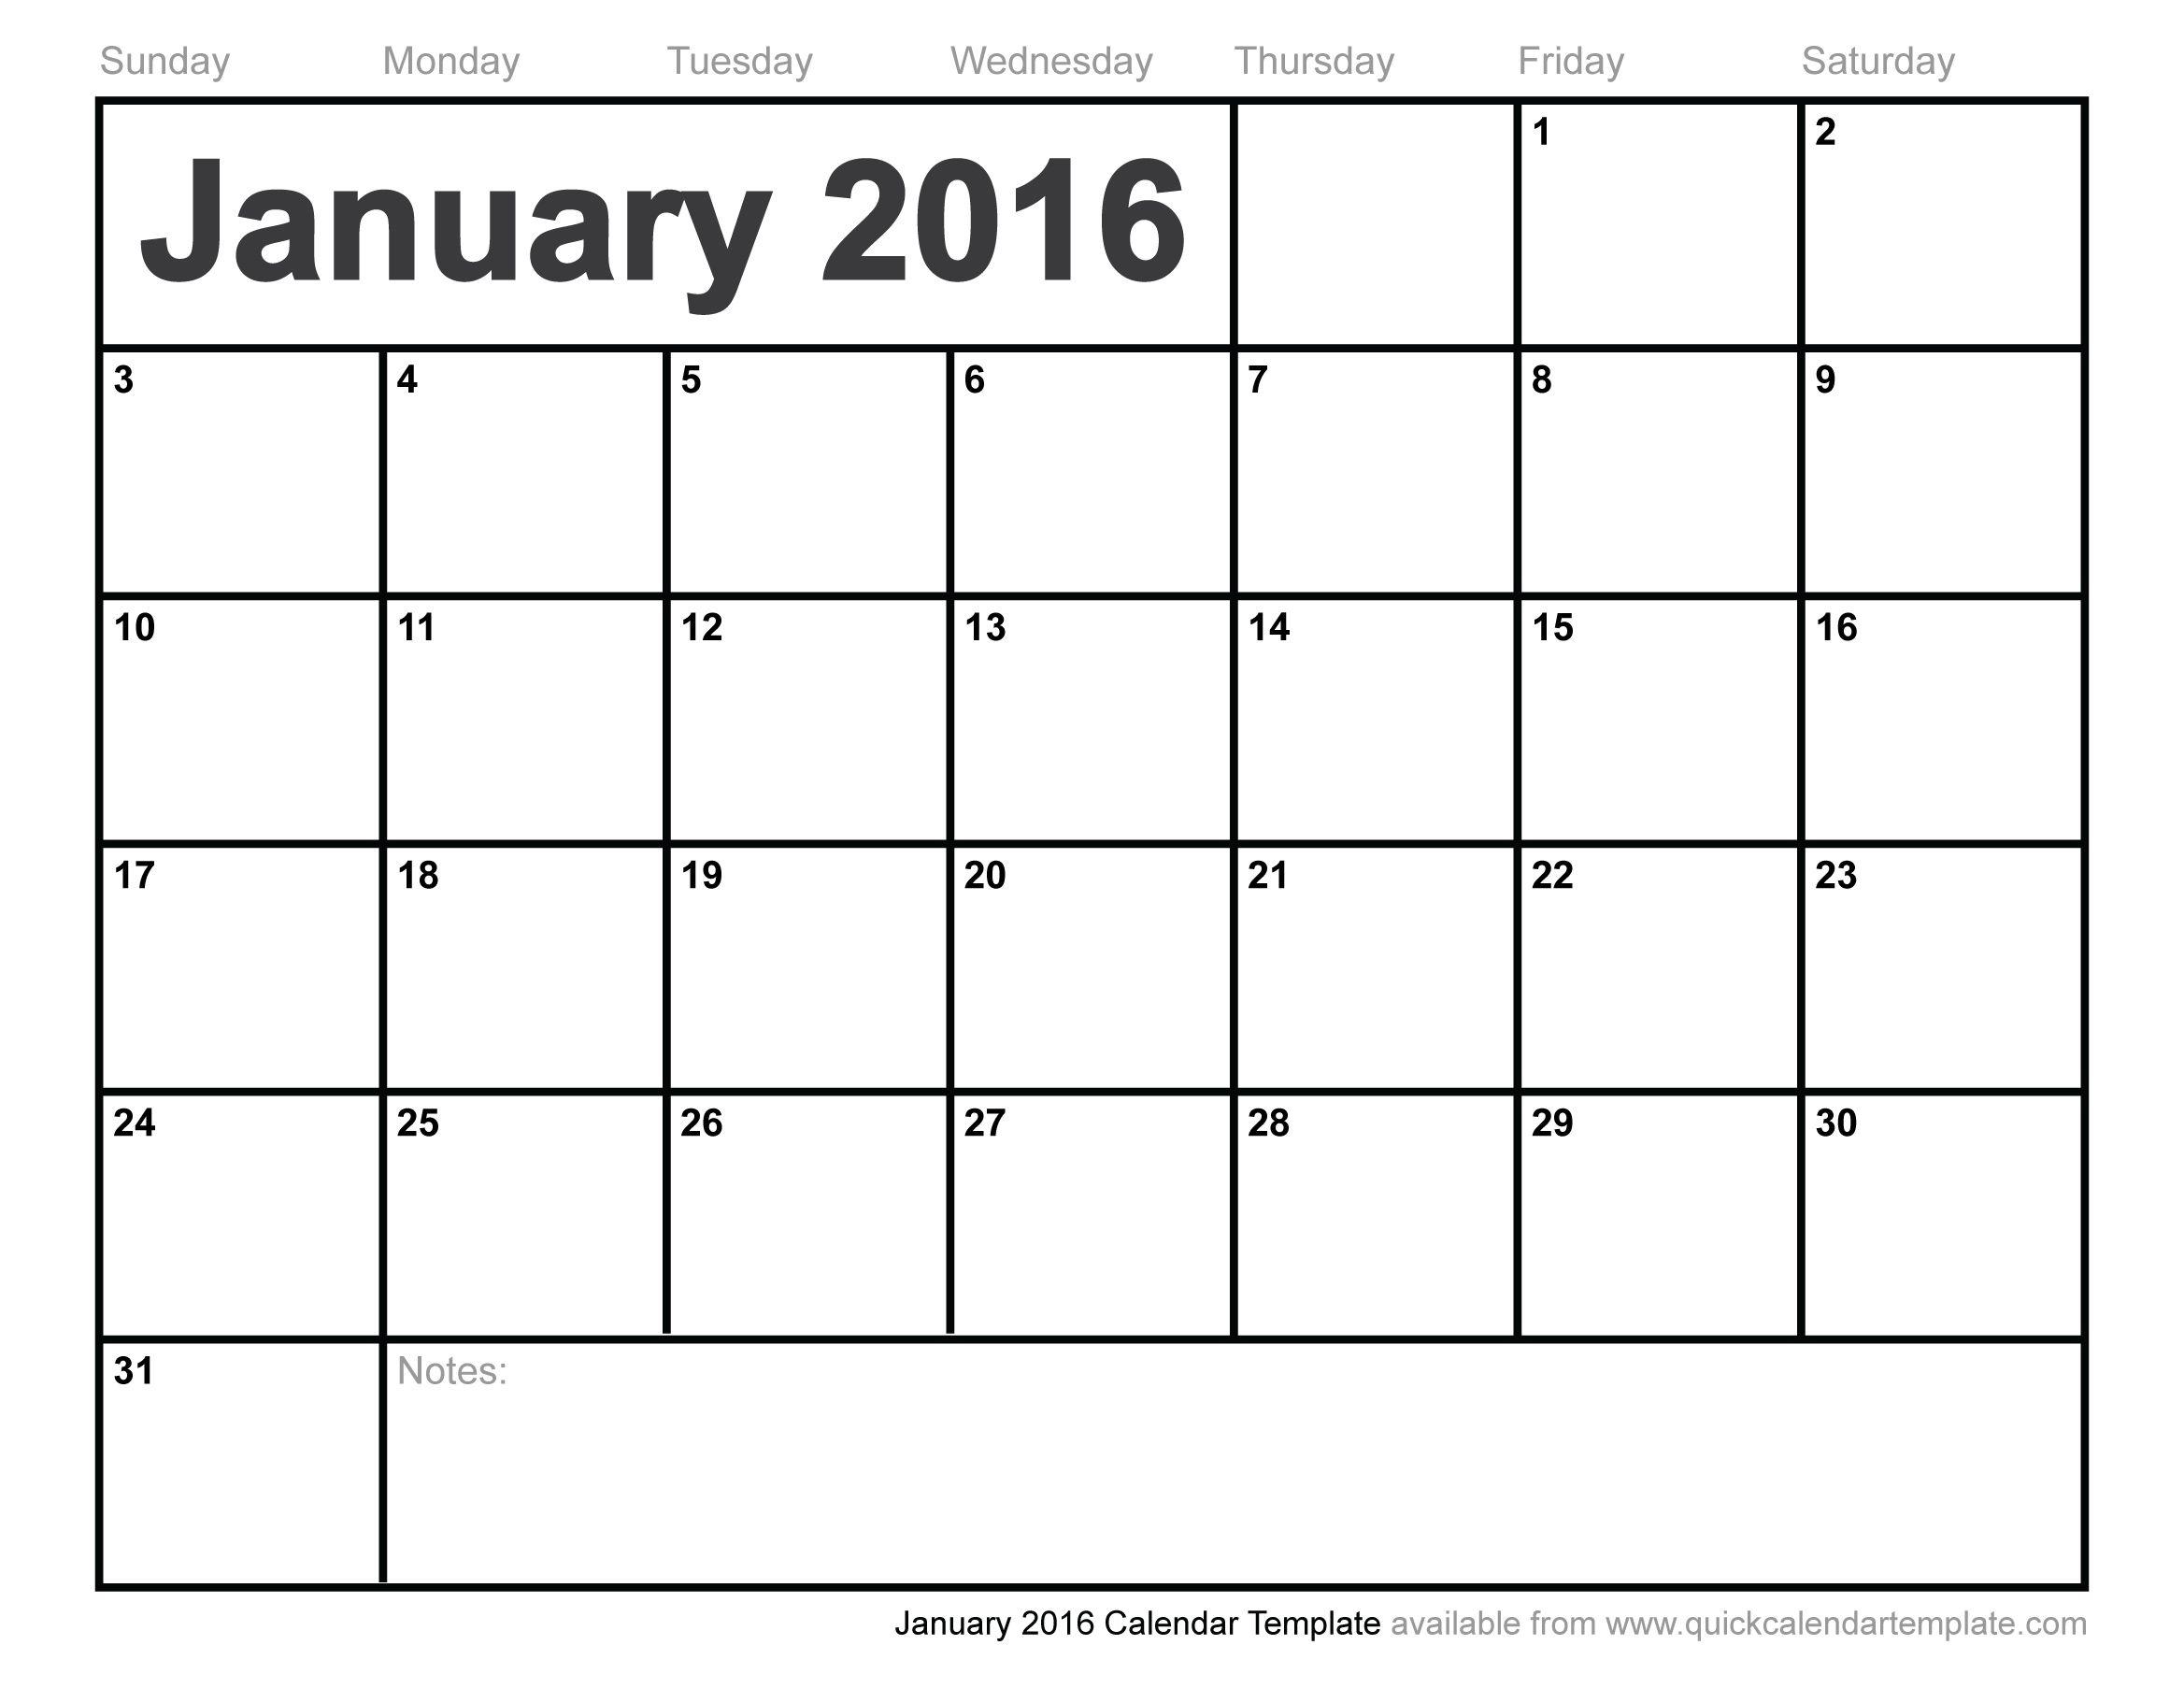 2016 calendar template excel 2016 calendar template word 2016 2016 calendar template excel 2016 calendar template word 2016 calendar template indesign 2015 pronofoot35fo Choice Image